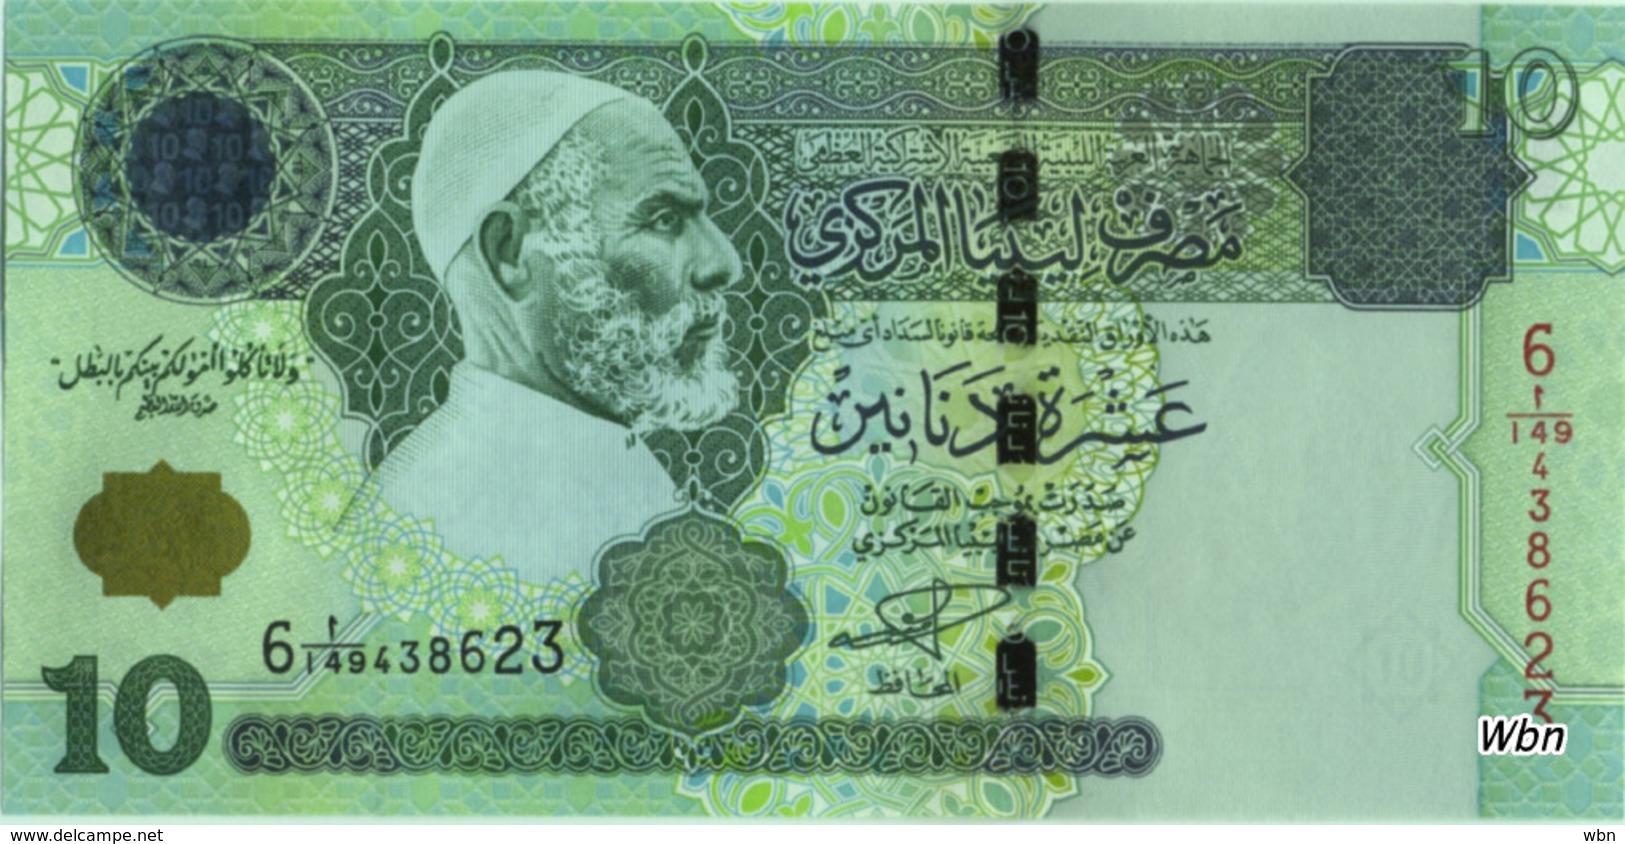 Libya 10 Dinars (P70) 2004 Sign 9 -UNC- - Libya